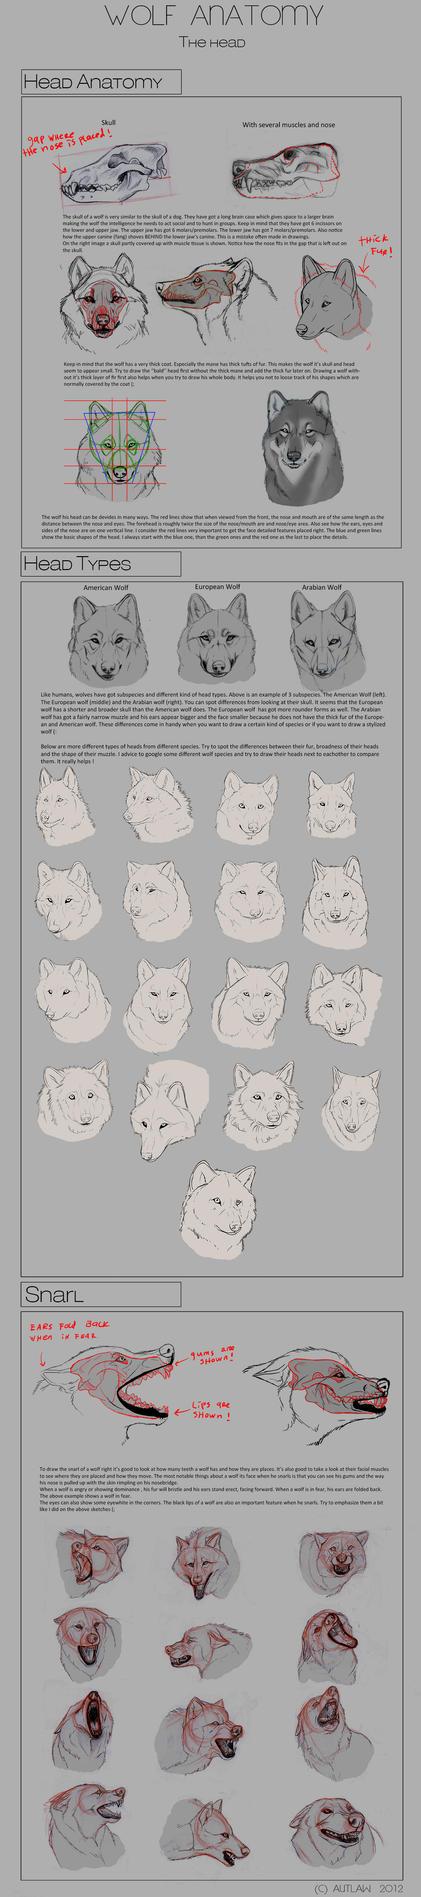 Wolf Anatomy - Part 3 by Autlaw